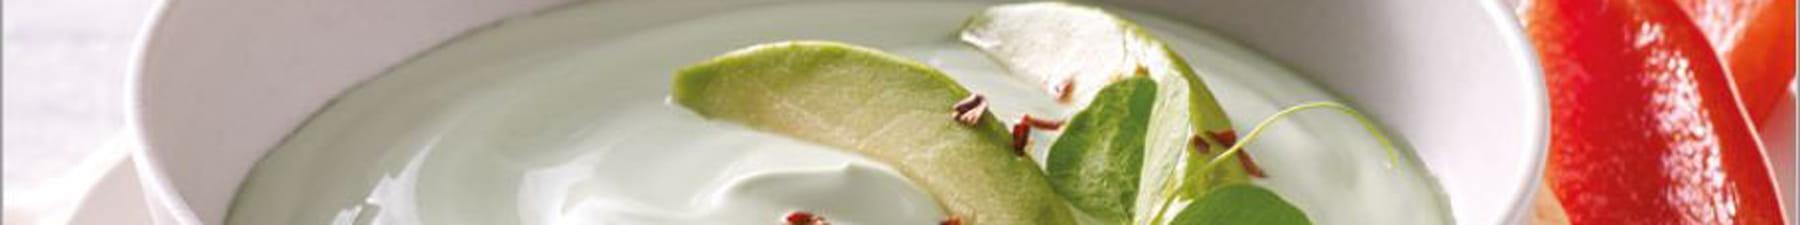 Green yogurt with avocado